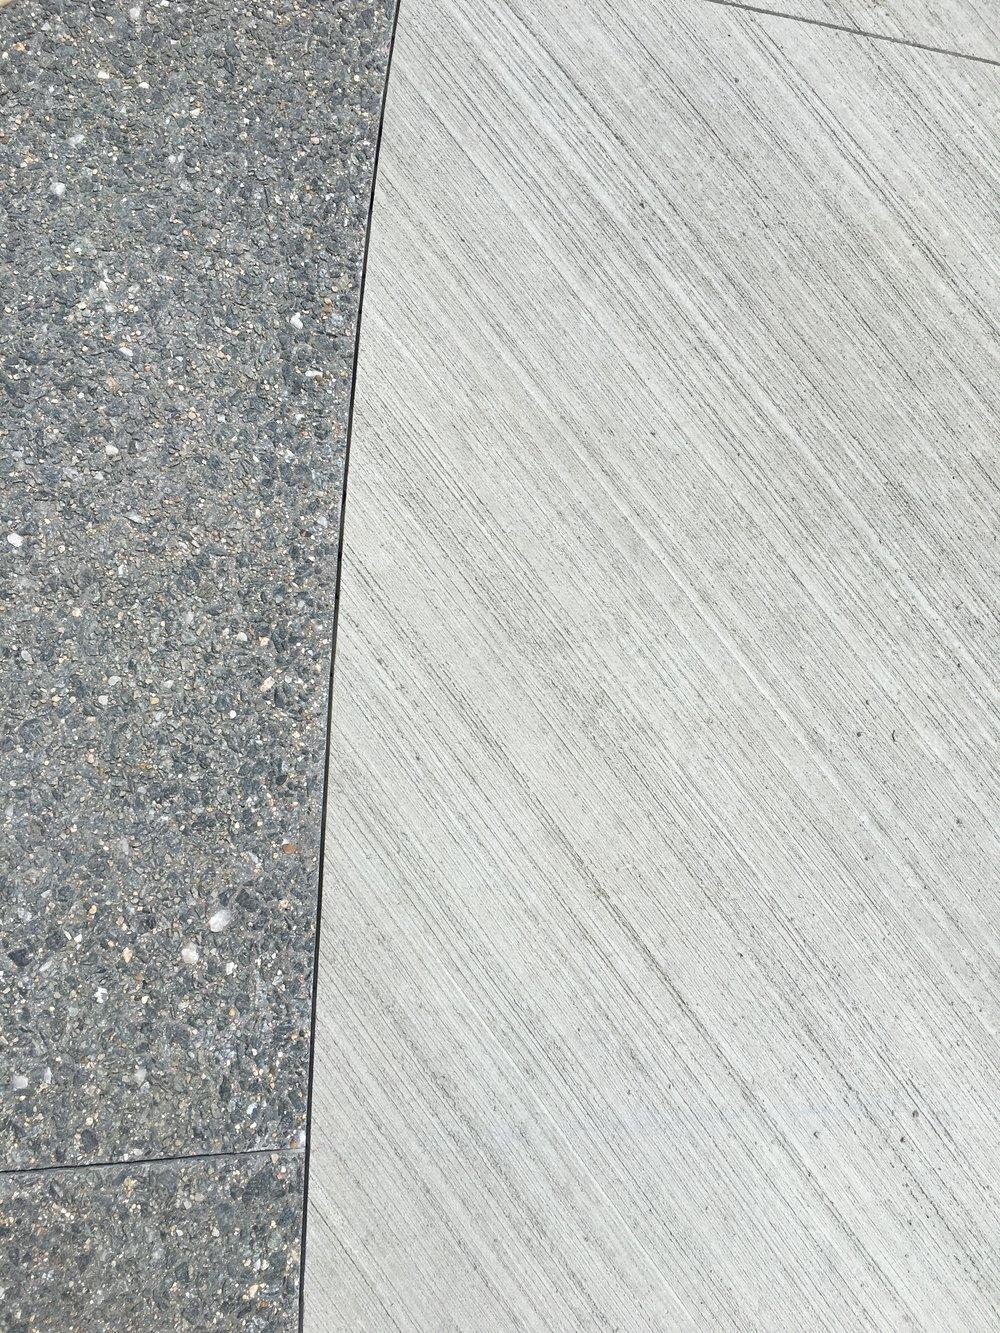 Exposed Concrete  NEU ISEC Boston, MA